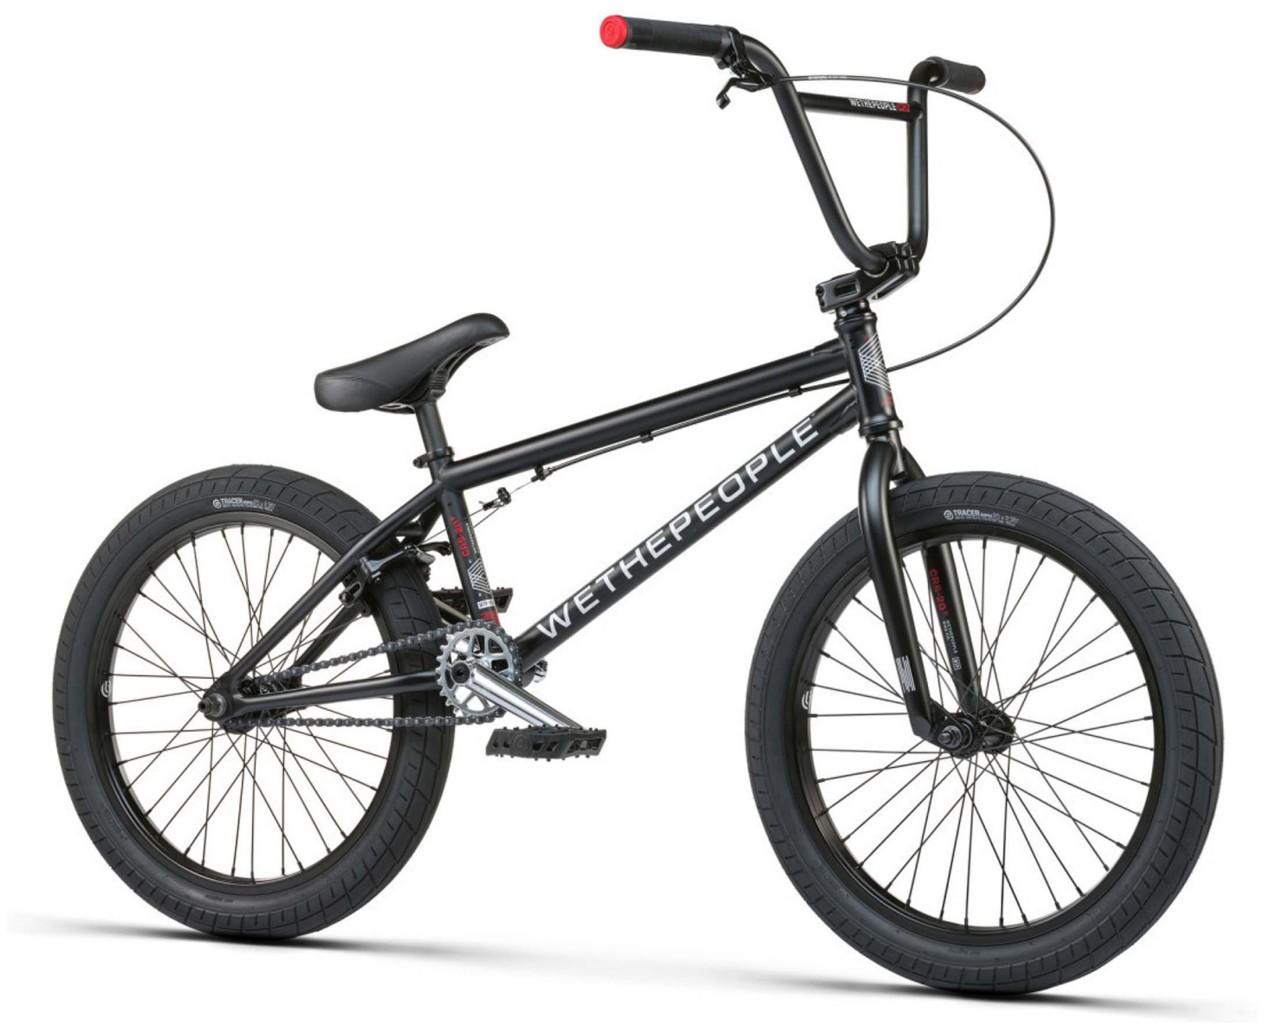 Wethepeople CRS 20 inch with Freecoaster - BMX Bike 2021 | matt black